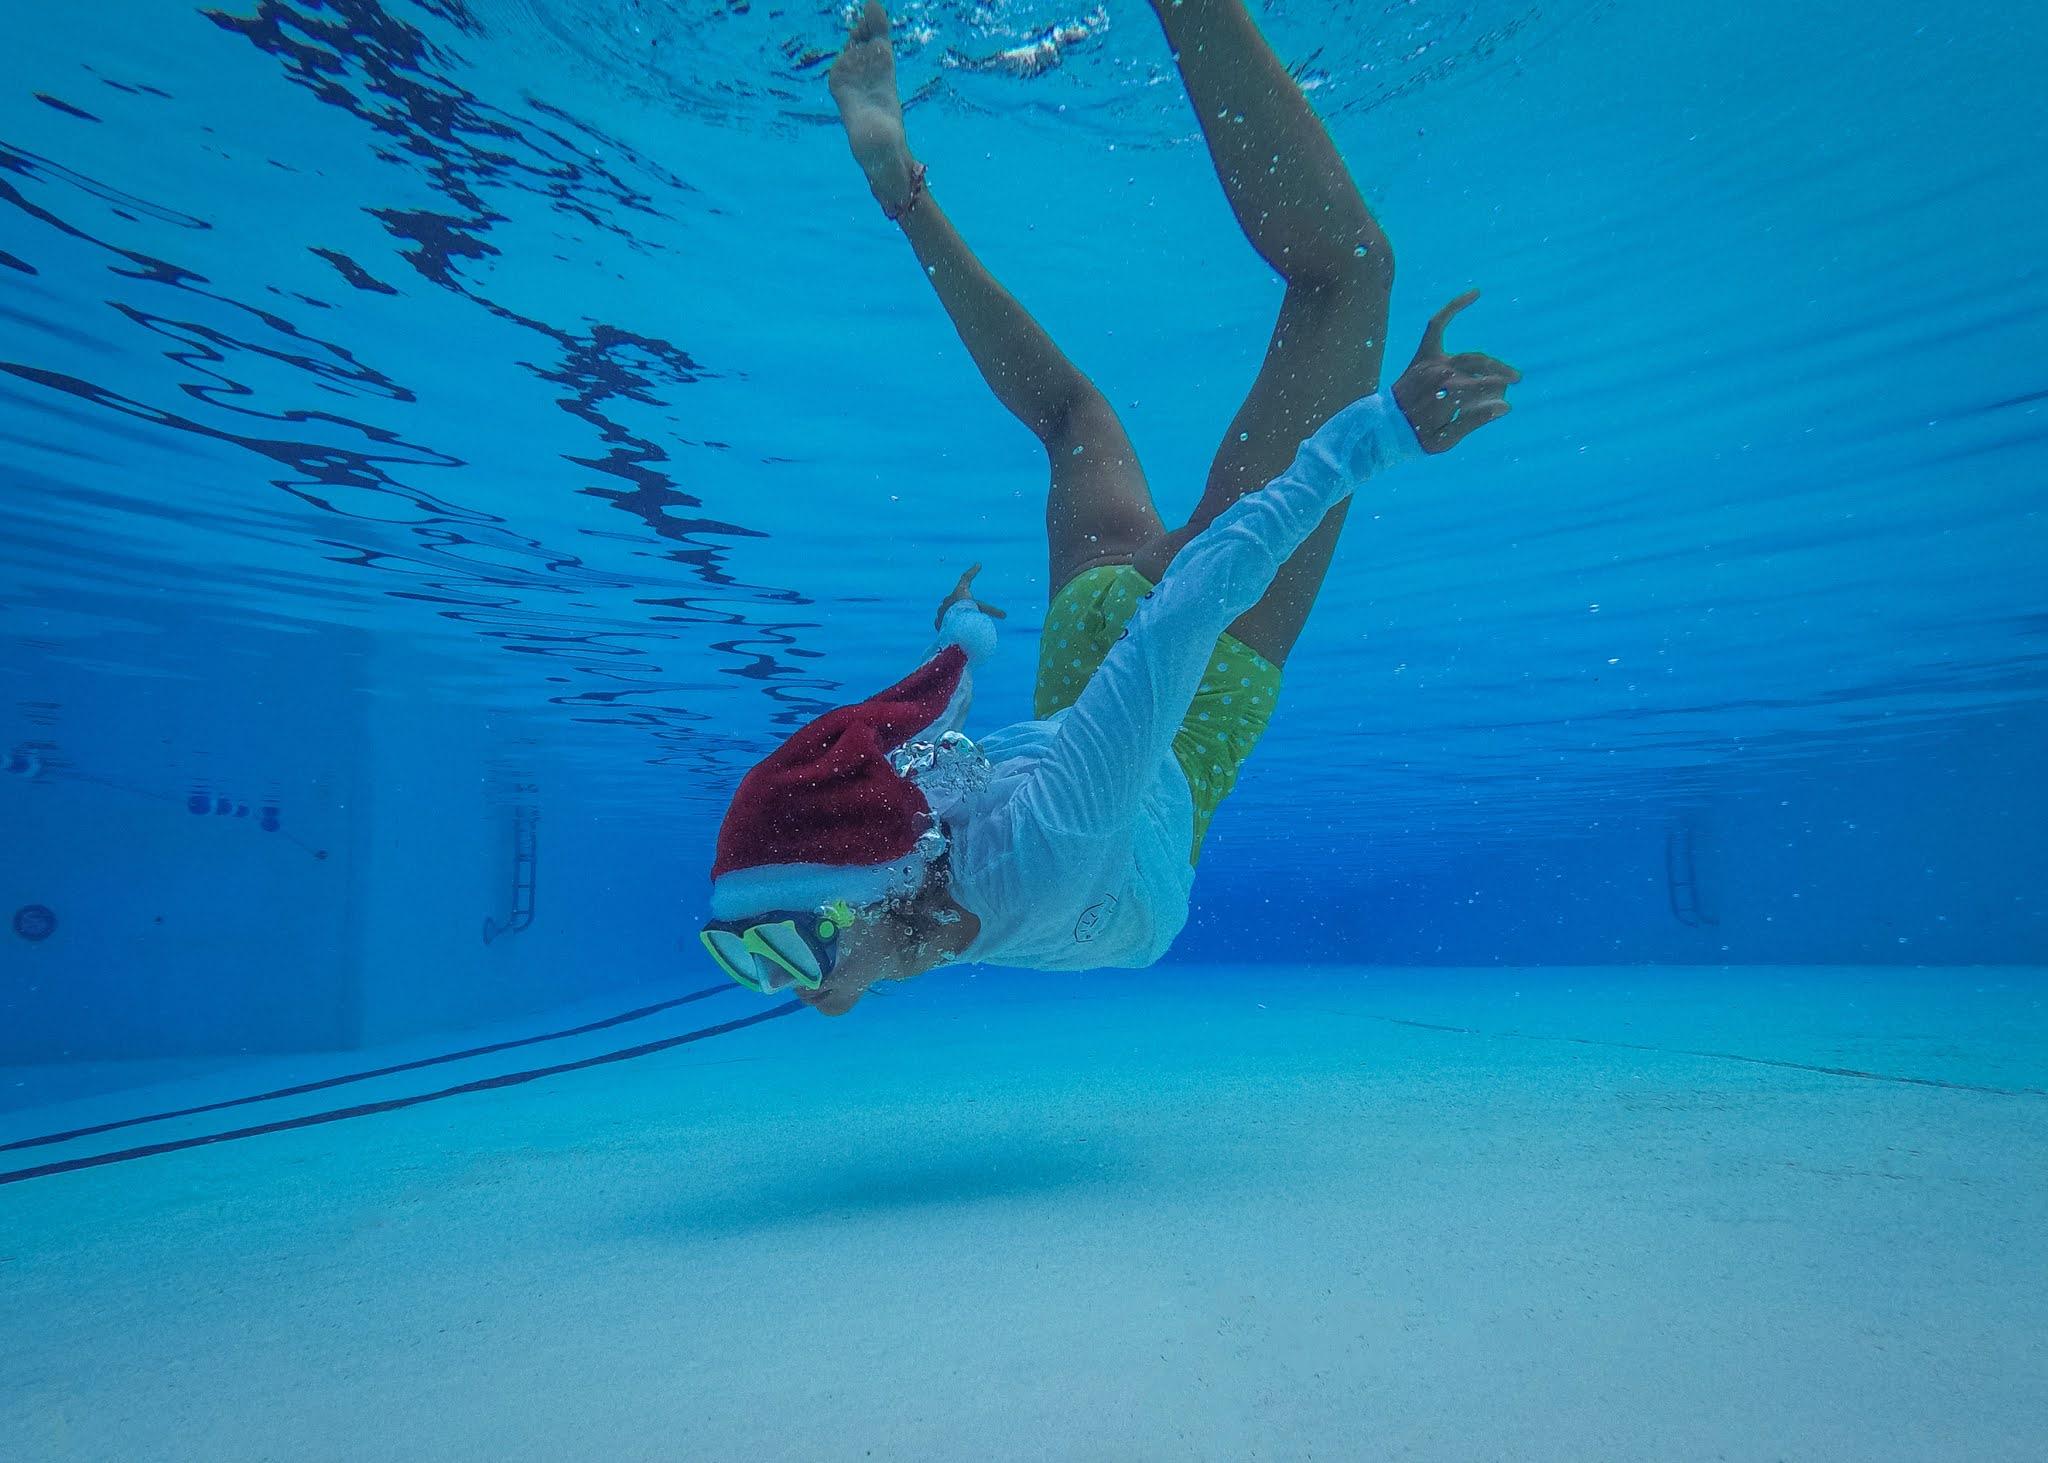 Swimming and spending Christmastime underwater